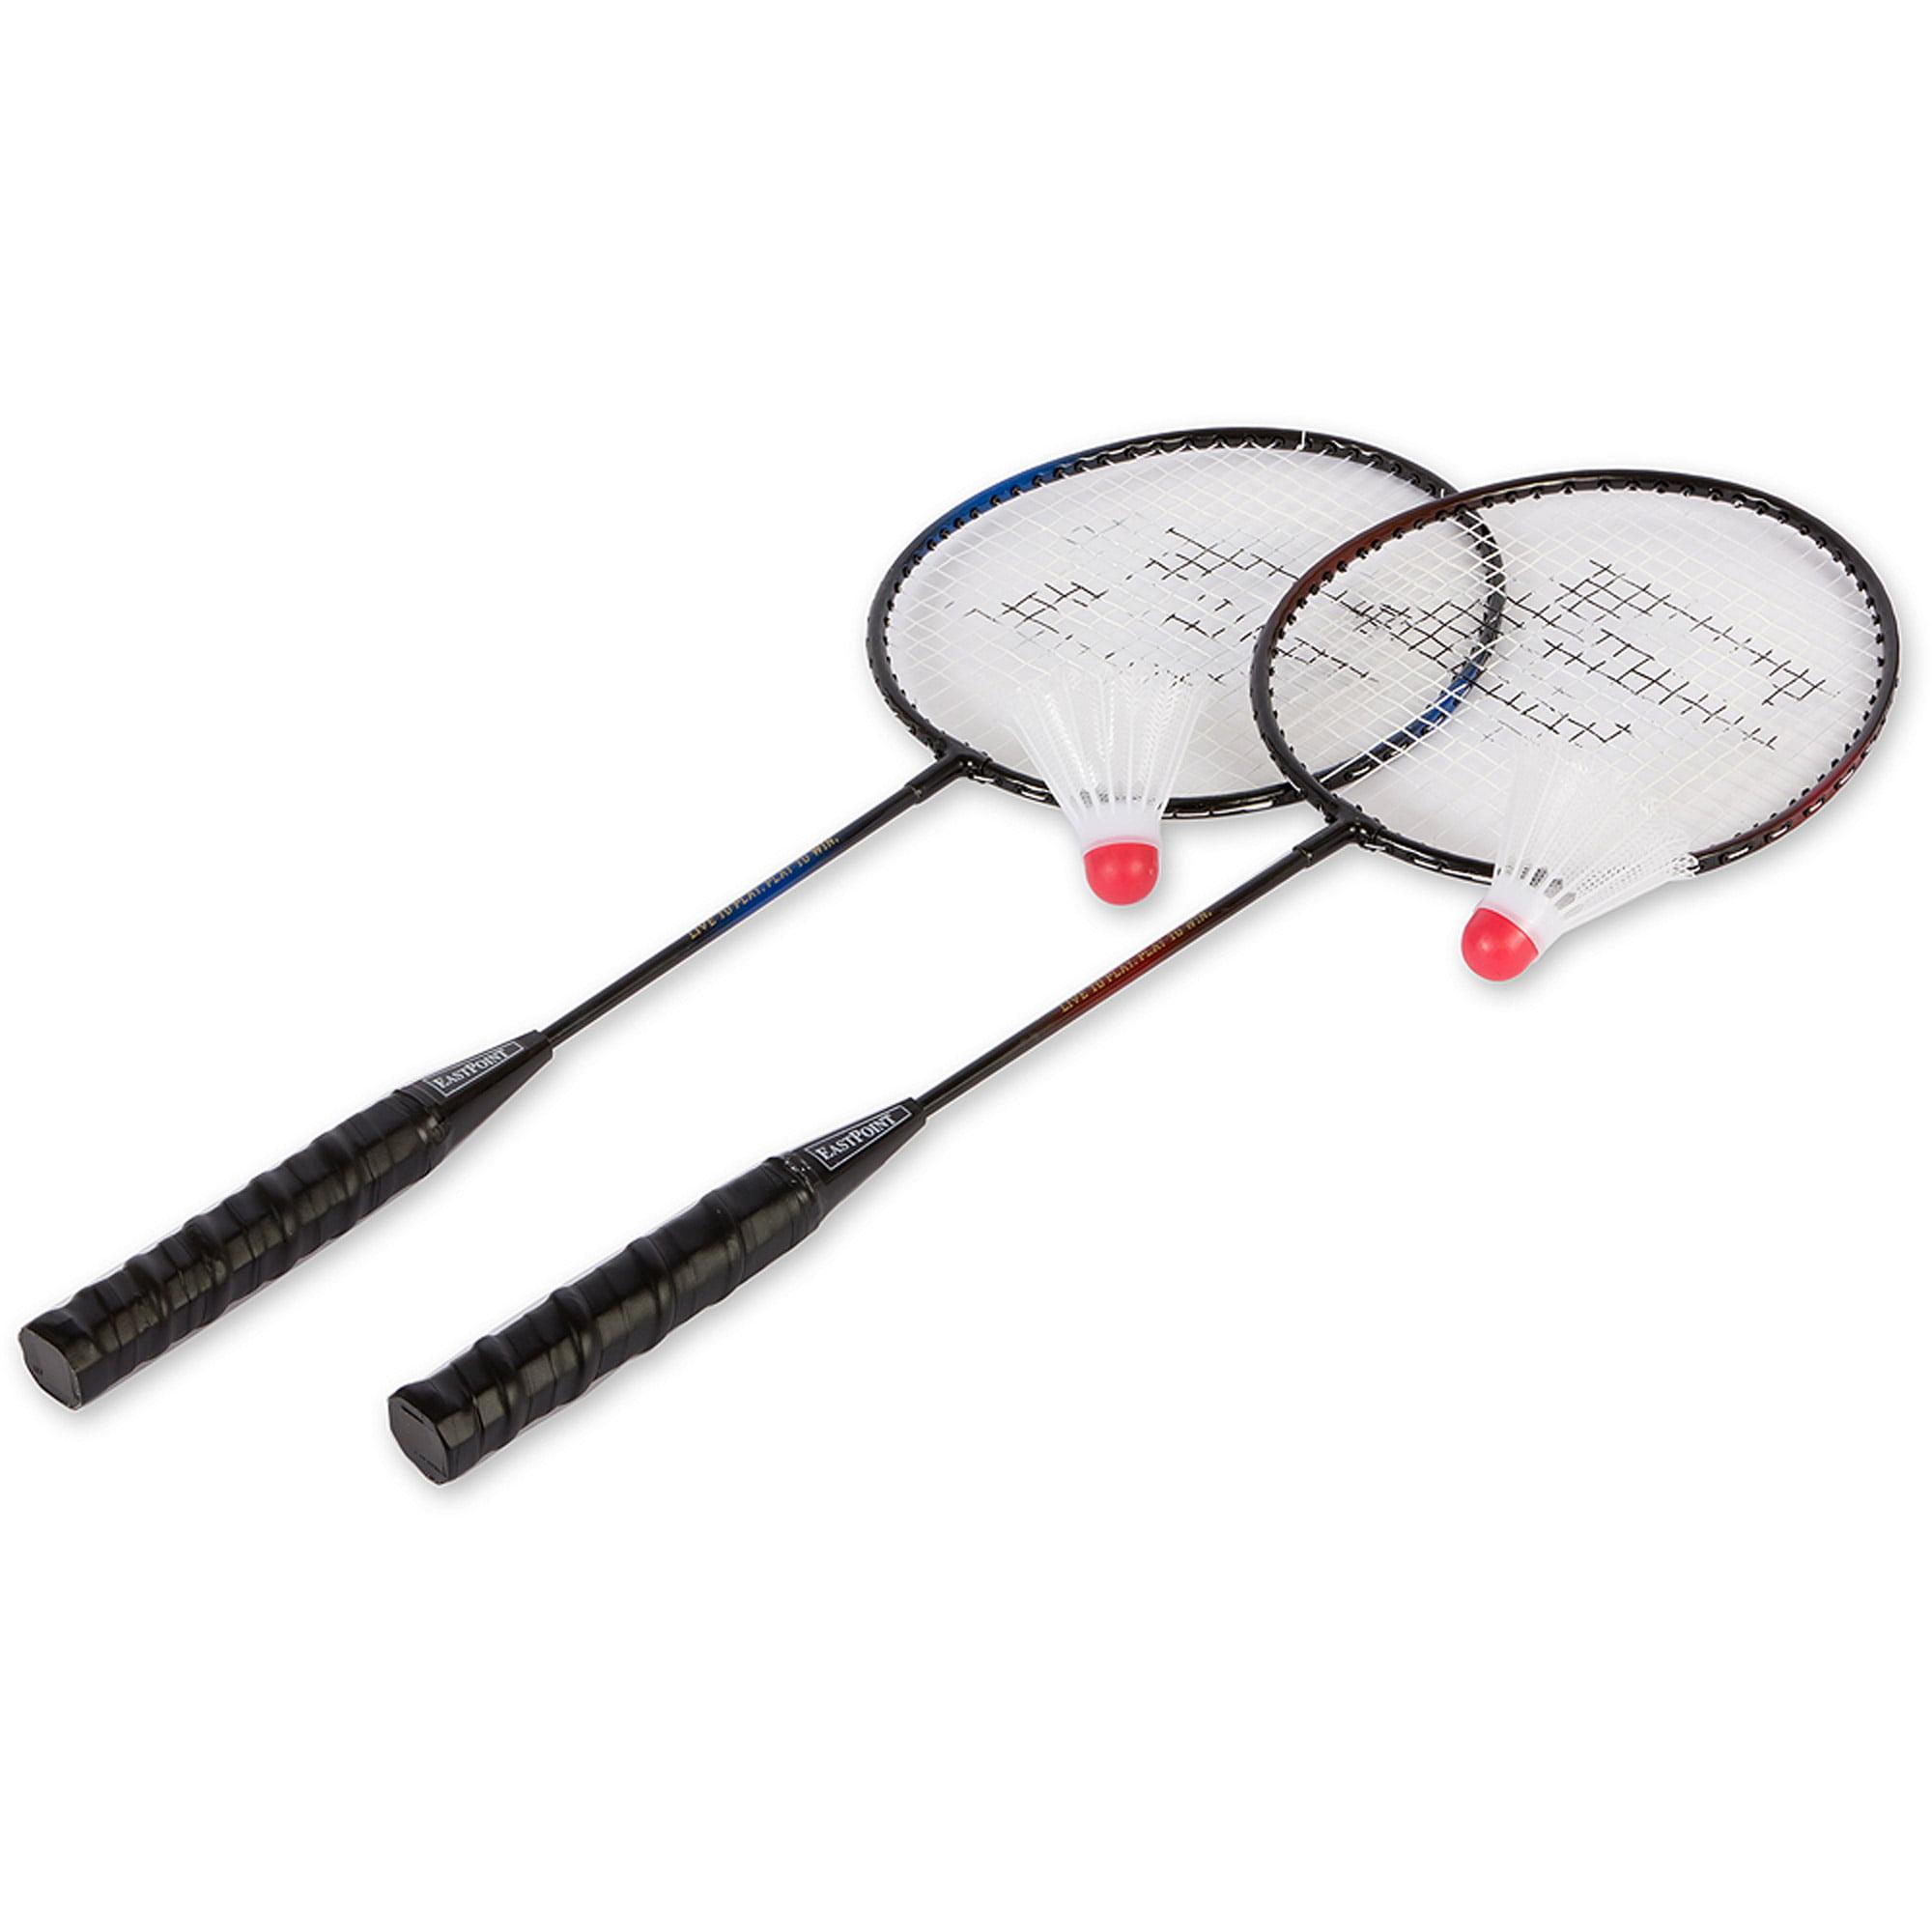 eastpoint sports 2 player badminton racket set walmart com